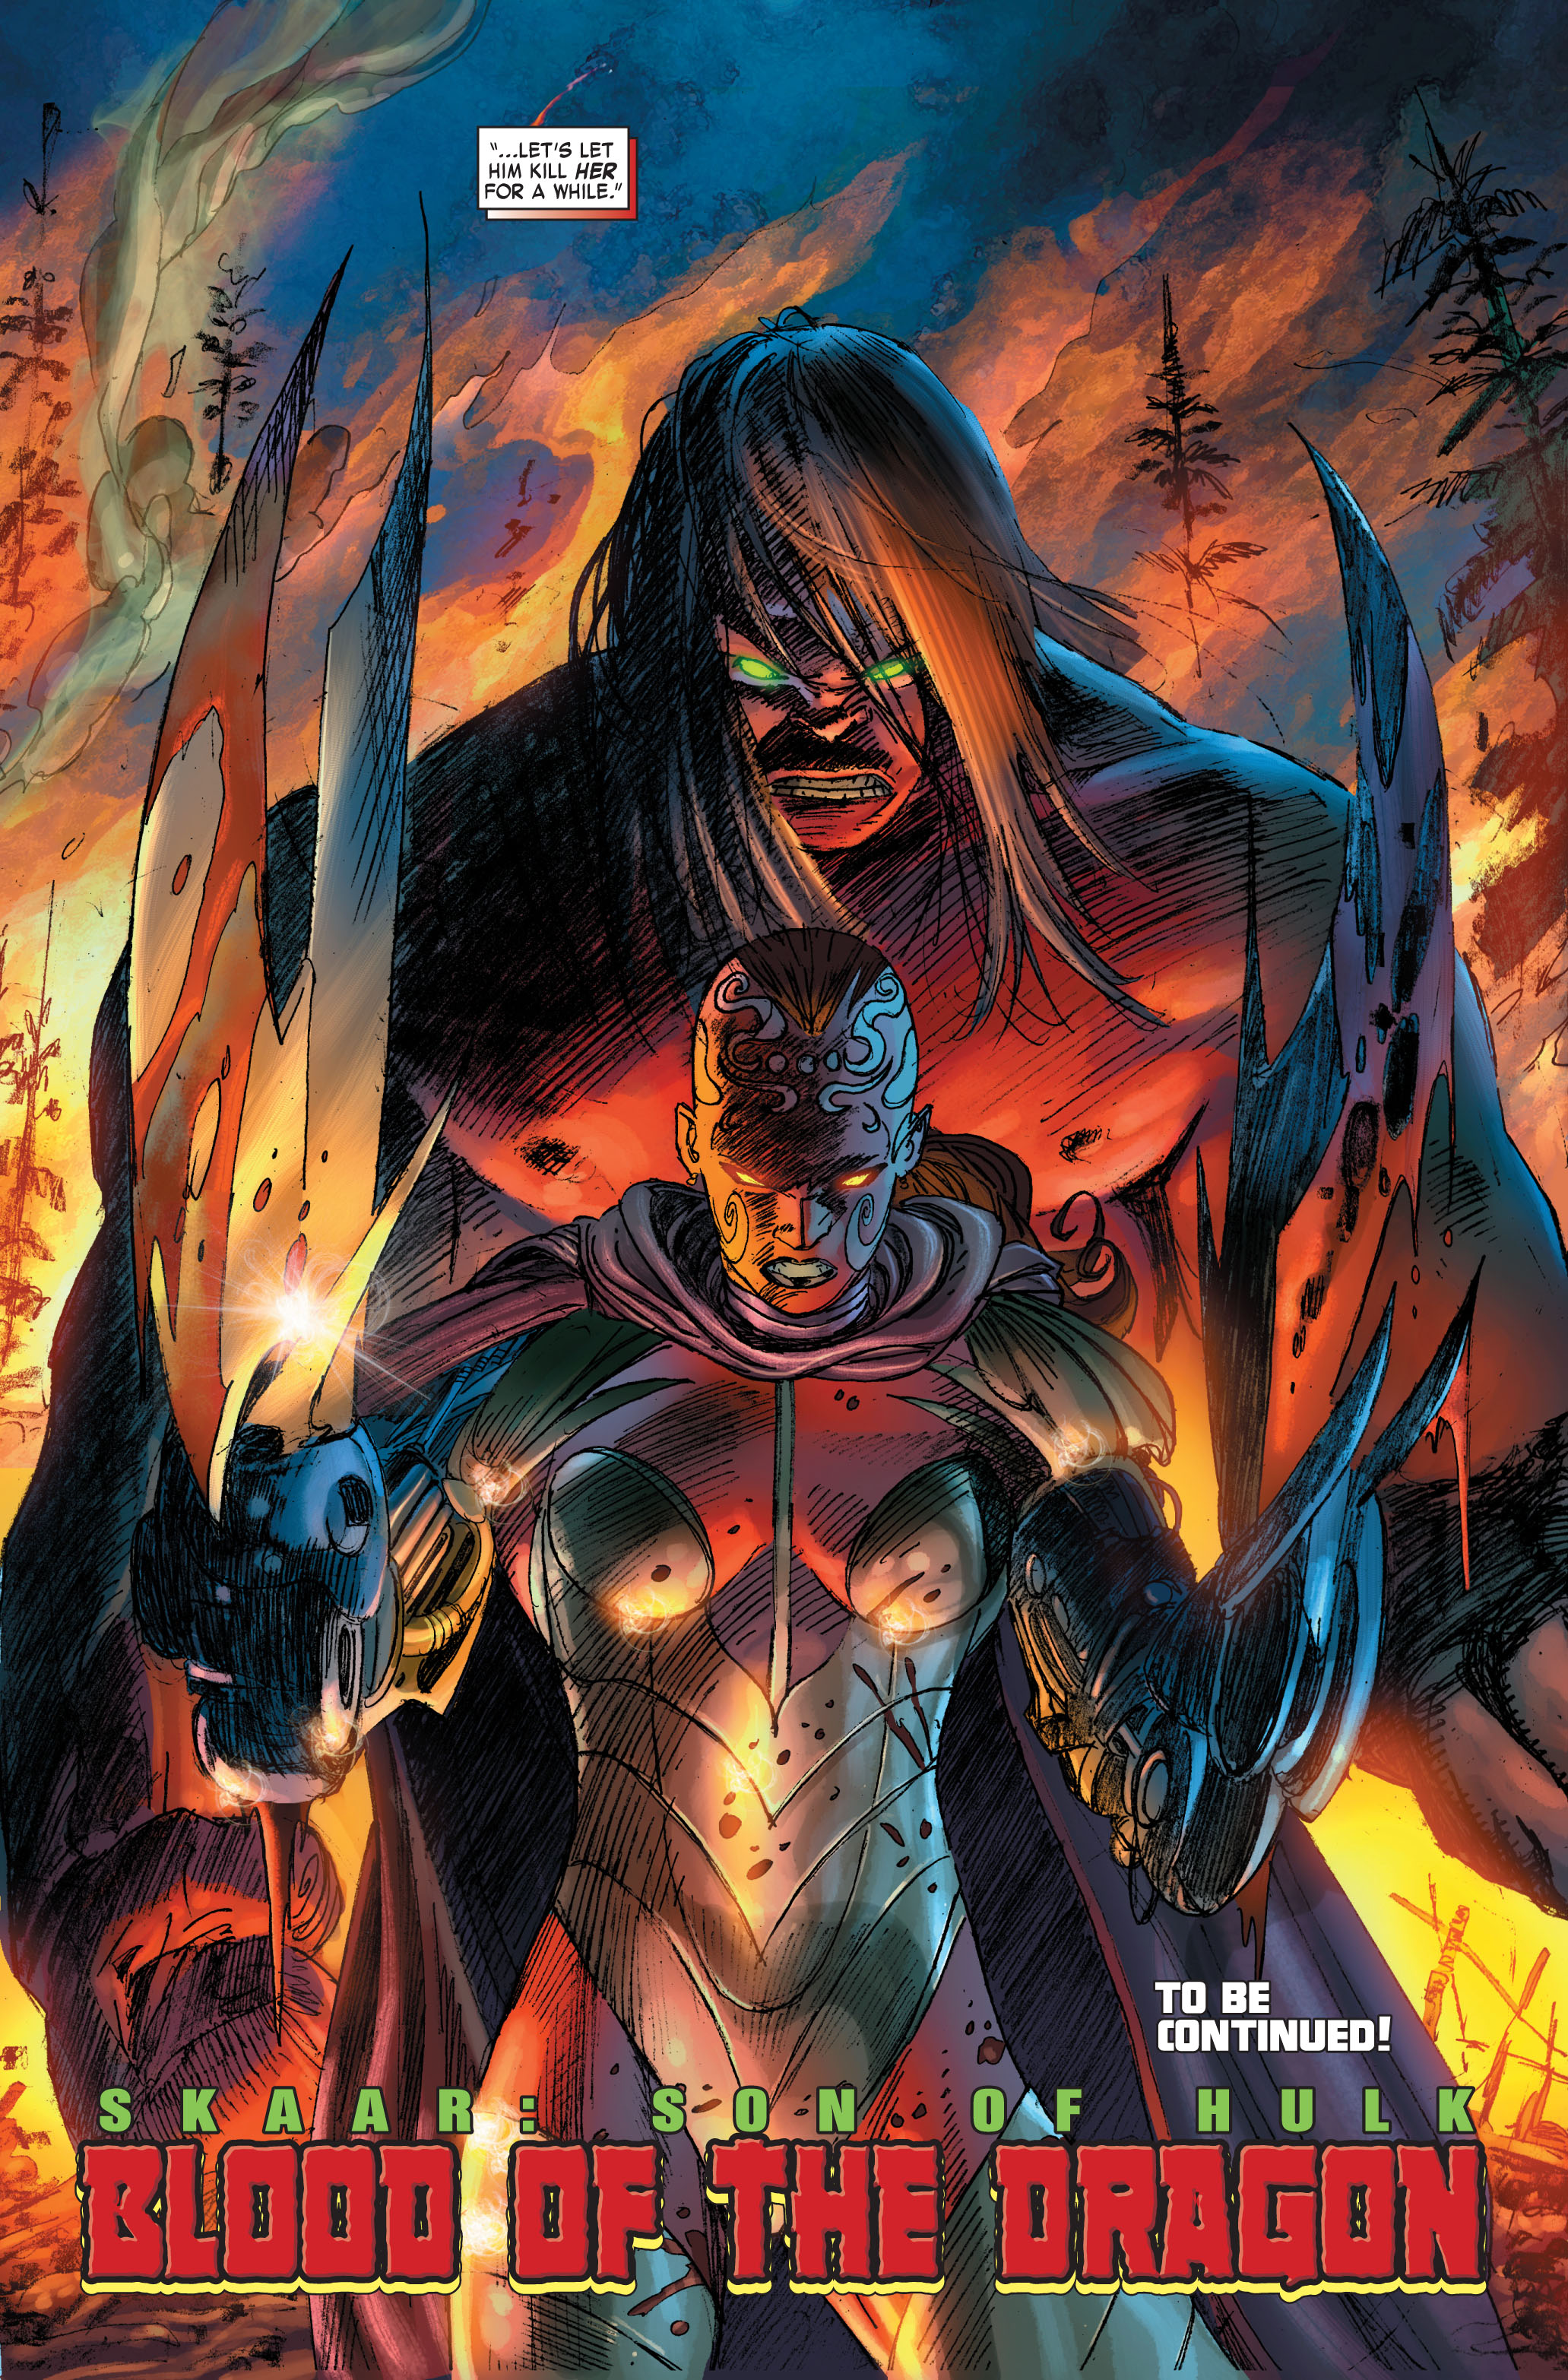 Read online Skaar: Son of Hulk comic -  Issue #2 - 16